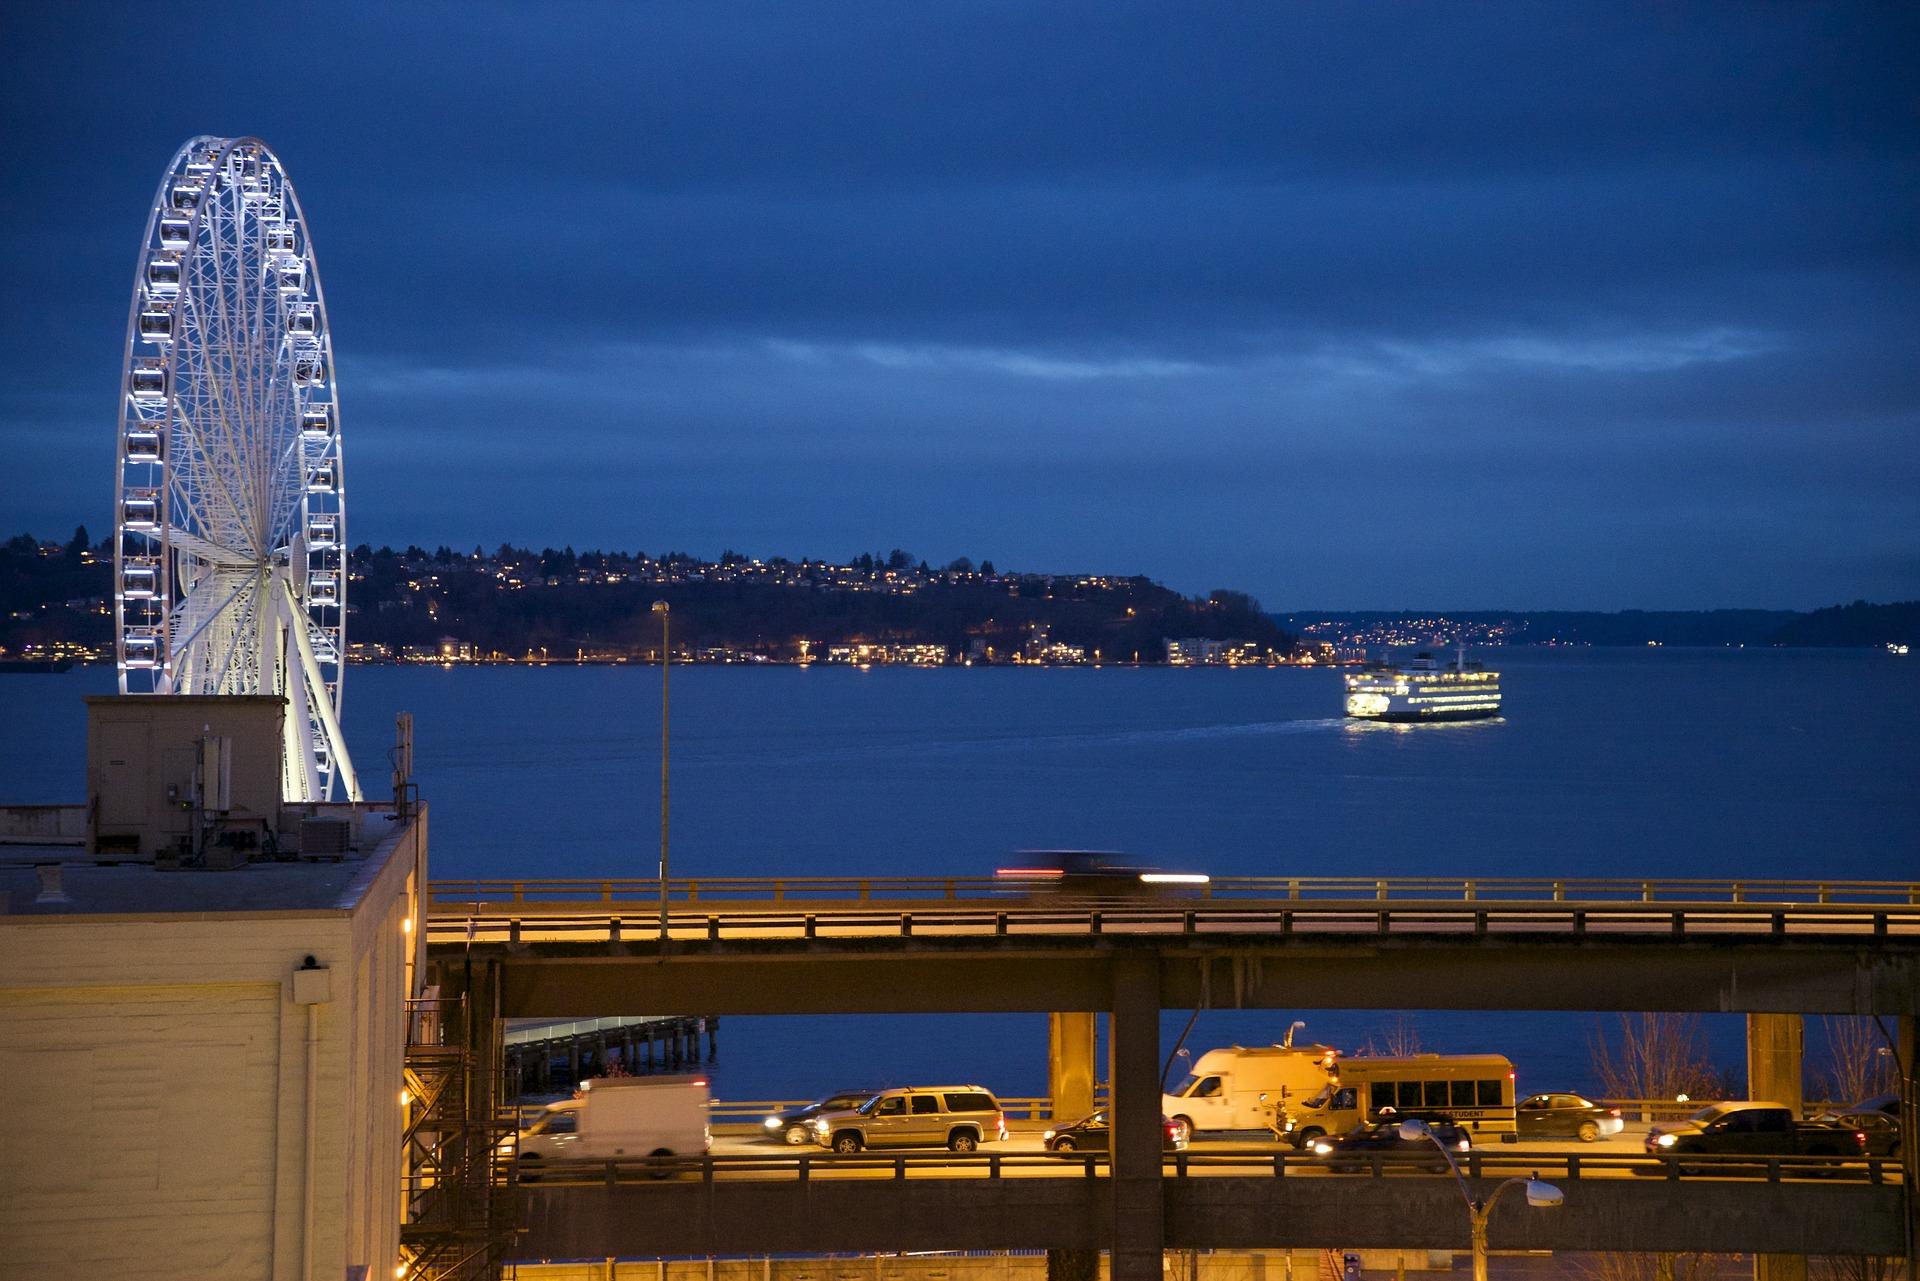 Seattle's Alaskan Way Viaduct at night.